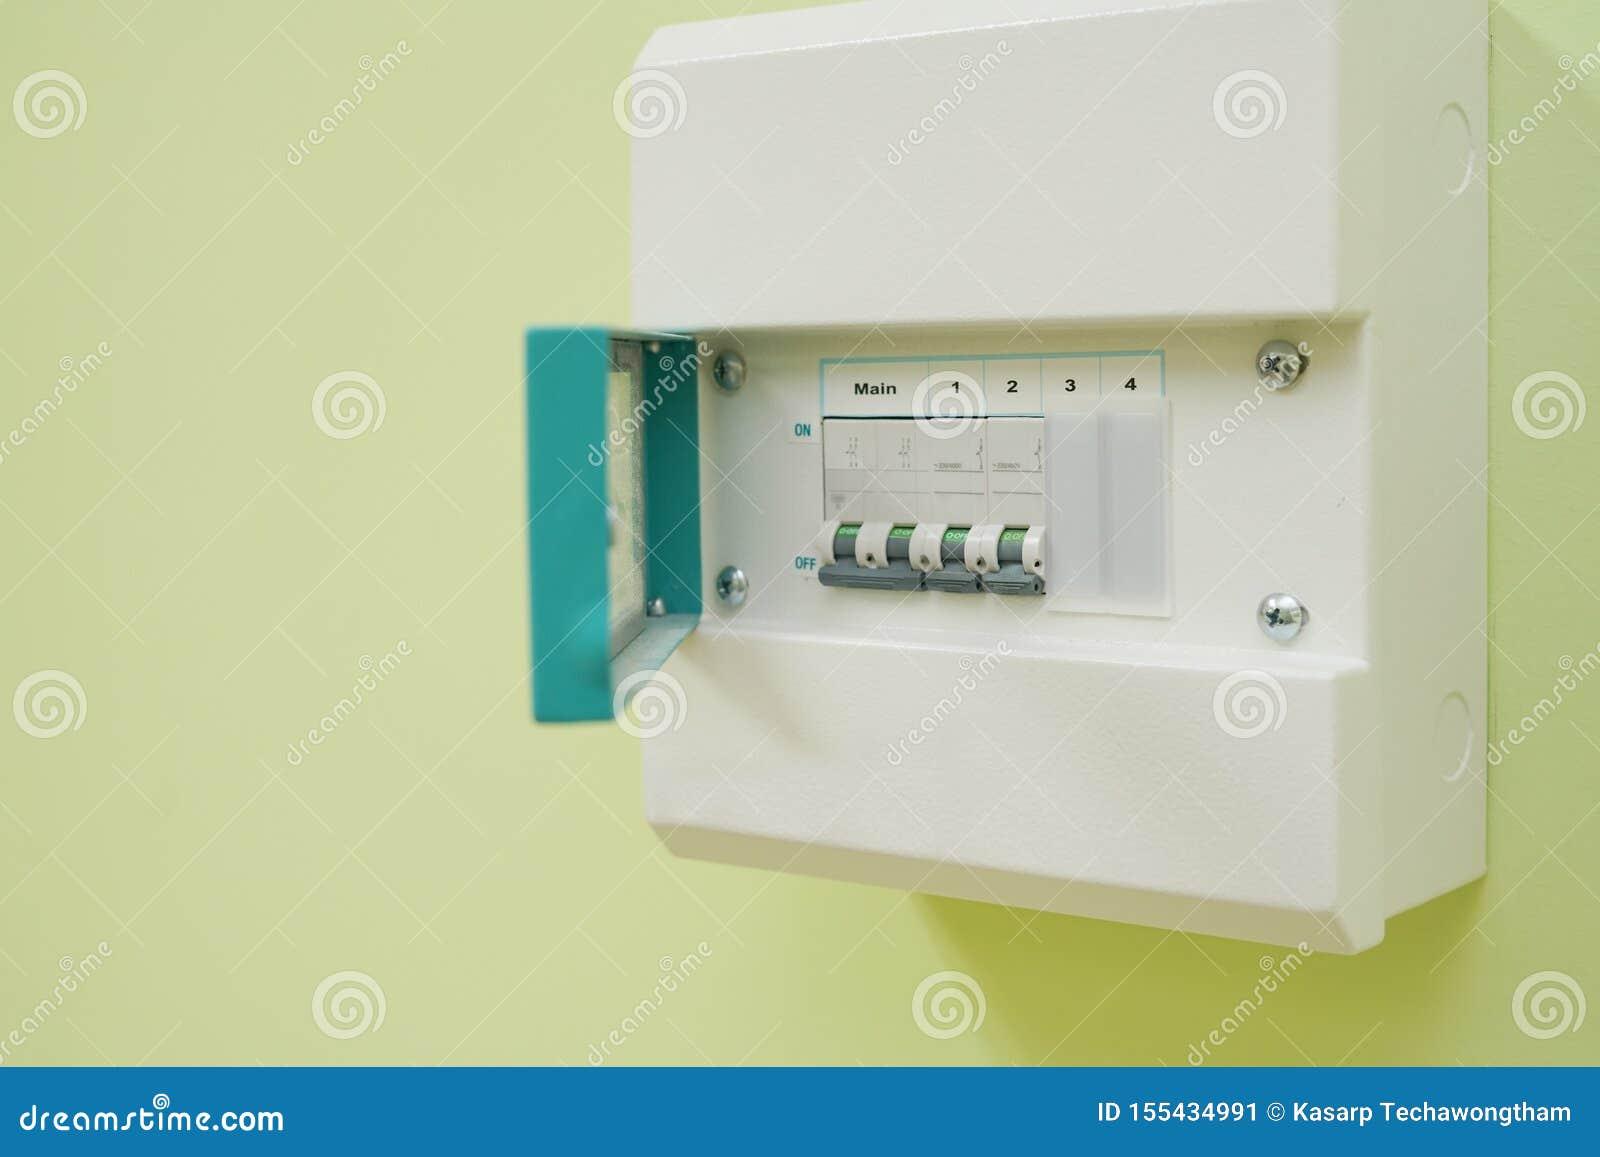 fuse box or breaker box micro circuit breaker or electrical breaker and consumer unit or  circuit breaker or electrical breaker